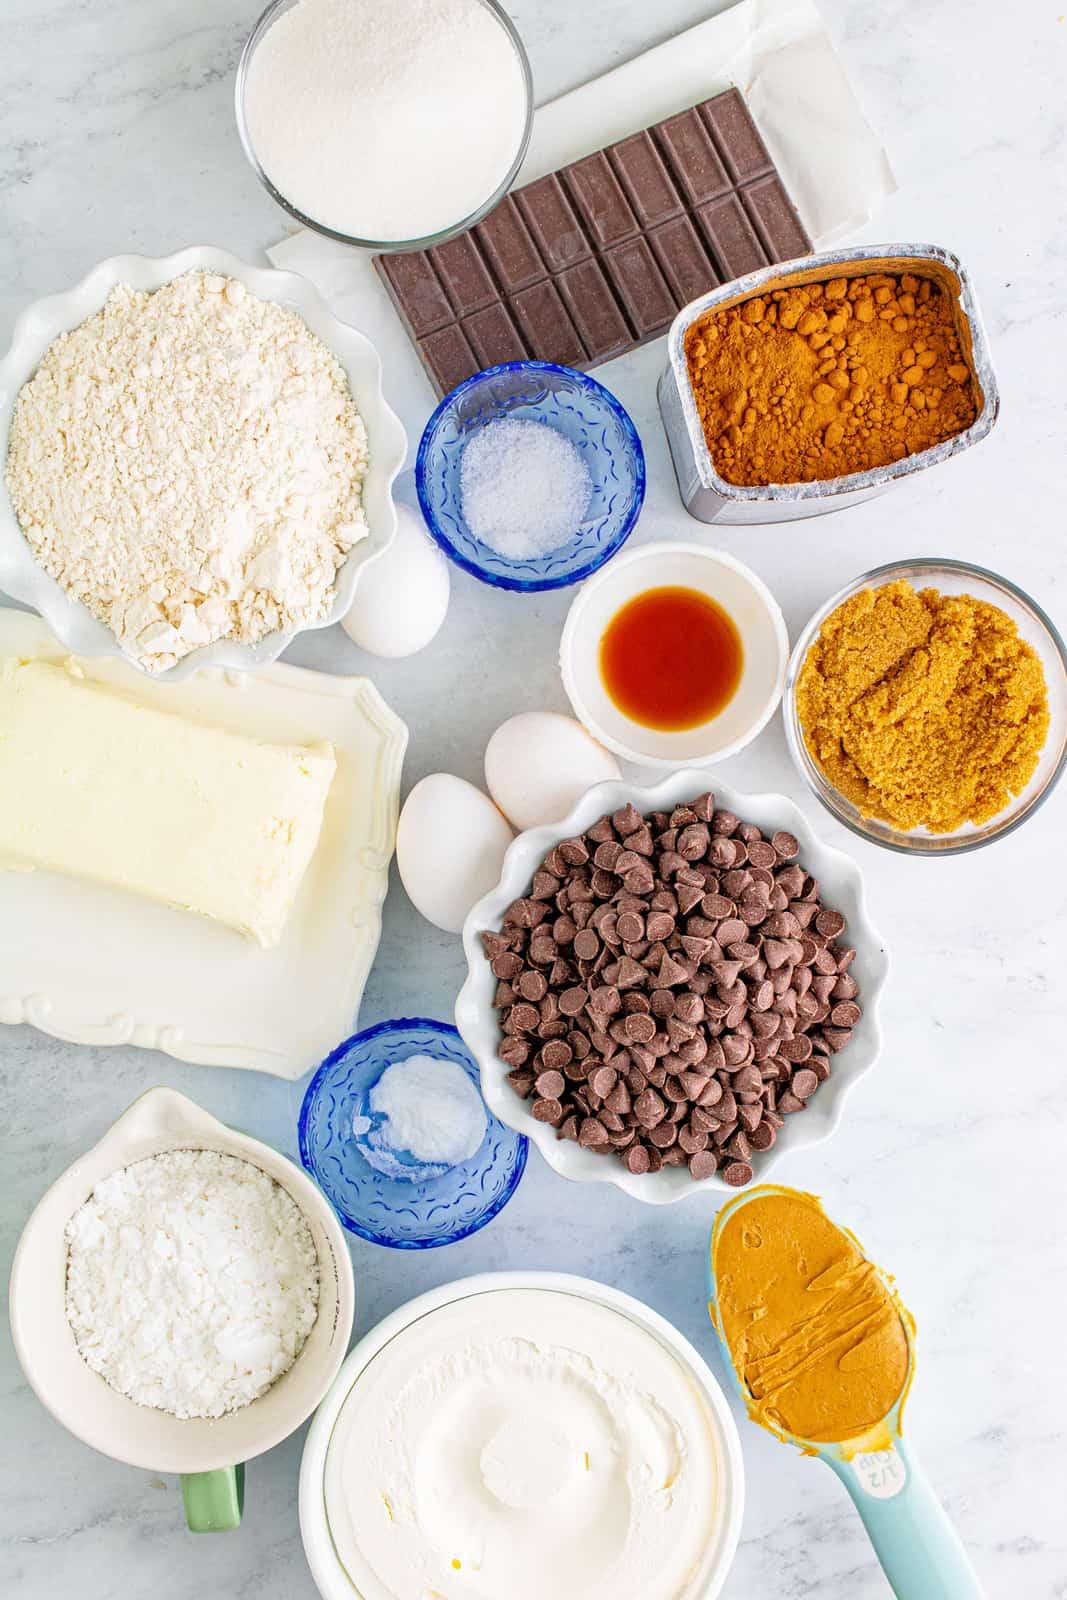 Ingredients needed to make Peanut Butter Brownies.